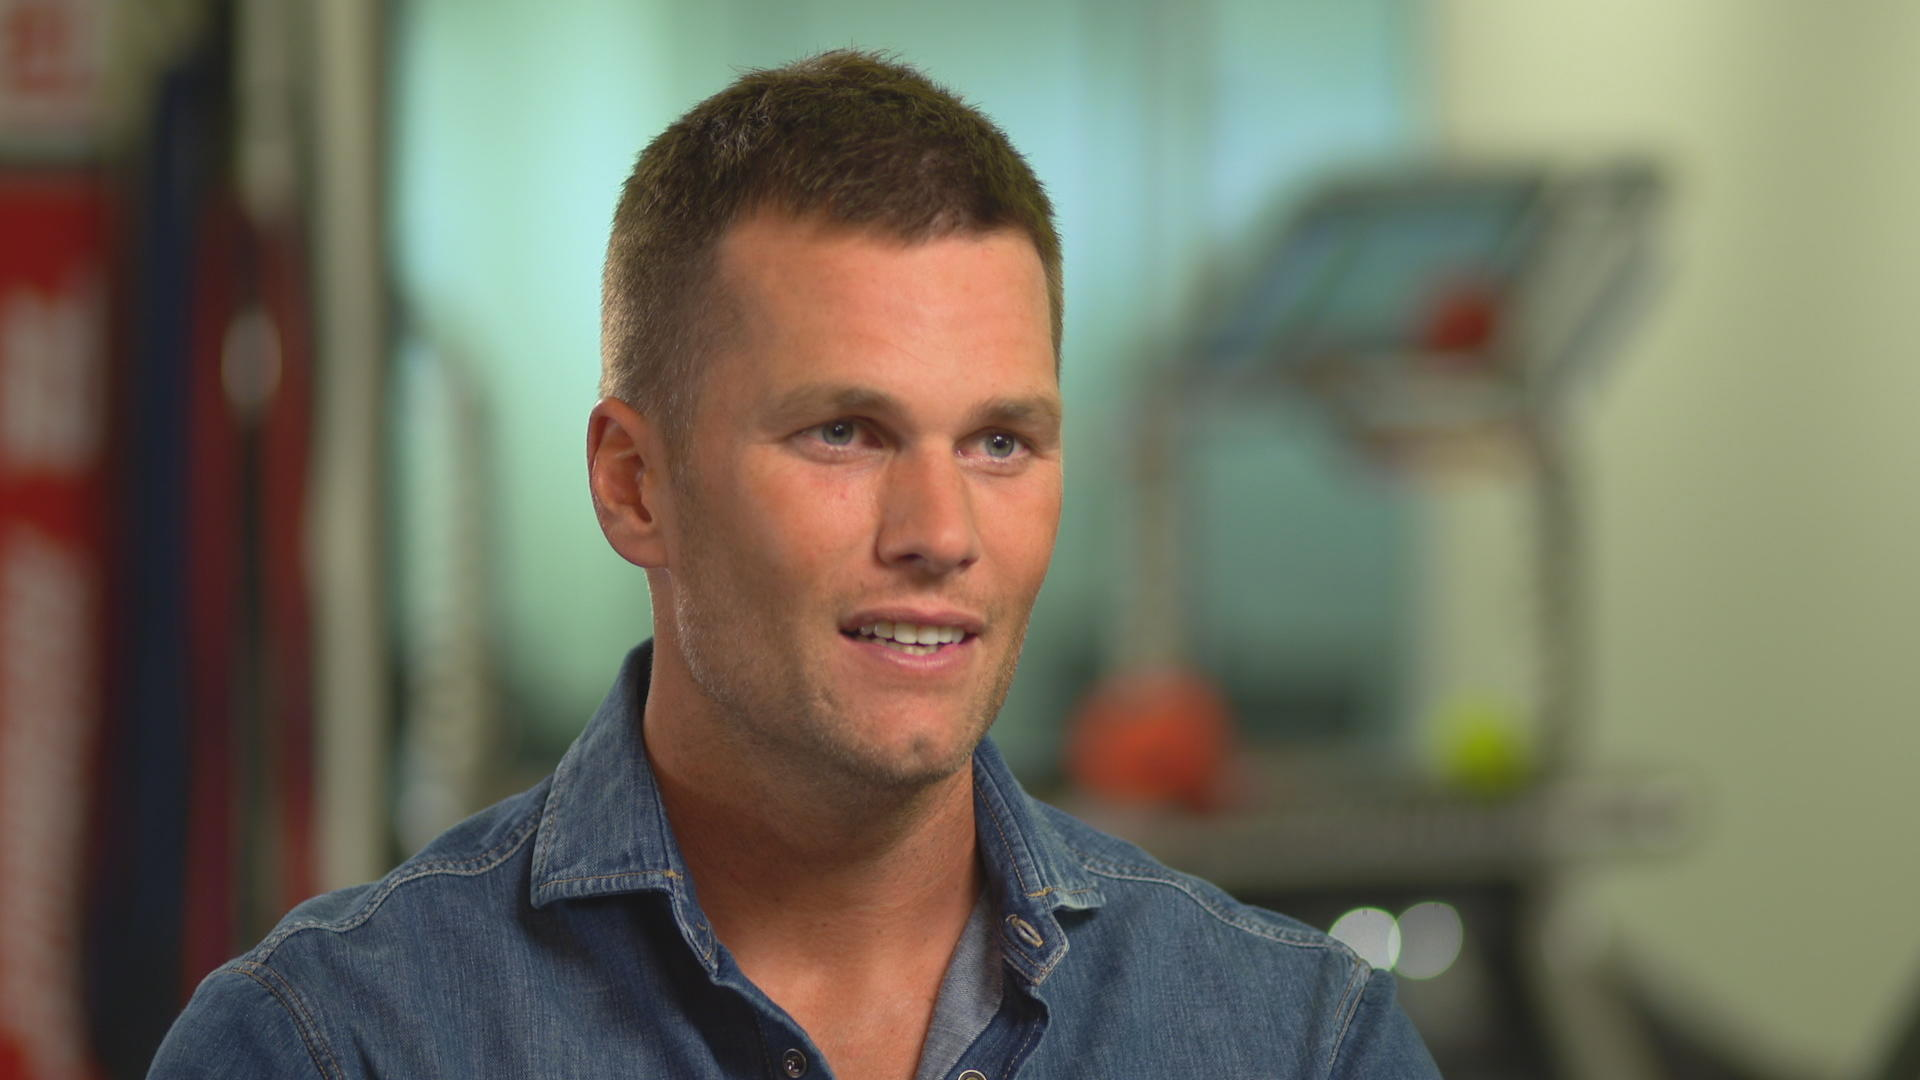 Tom Brady at 40 and still beating the clock CBS News